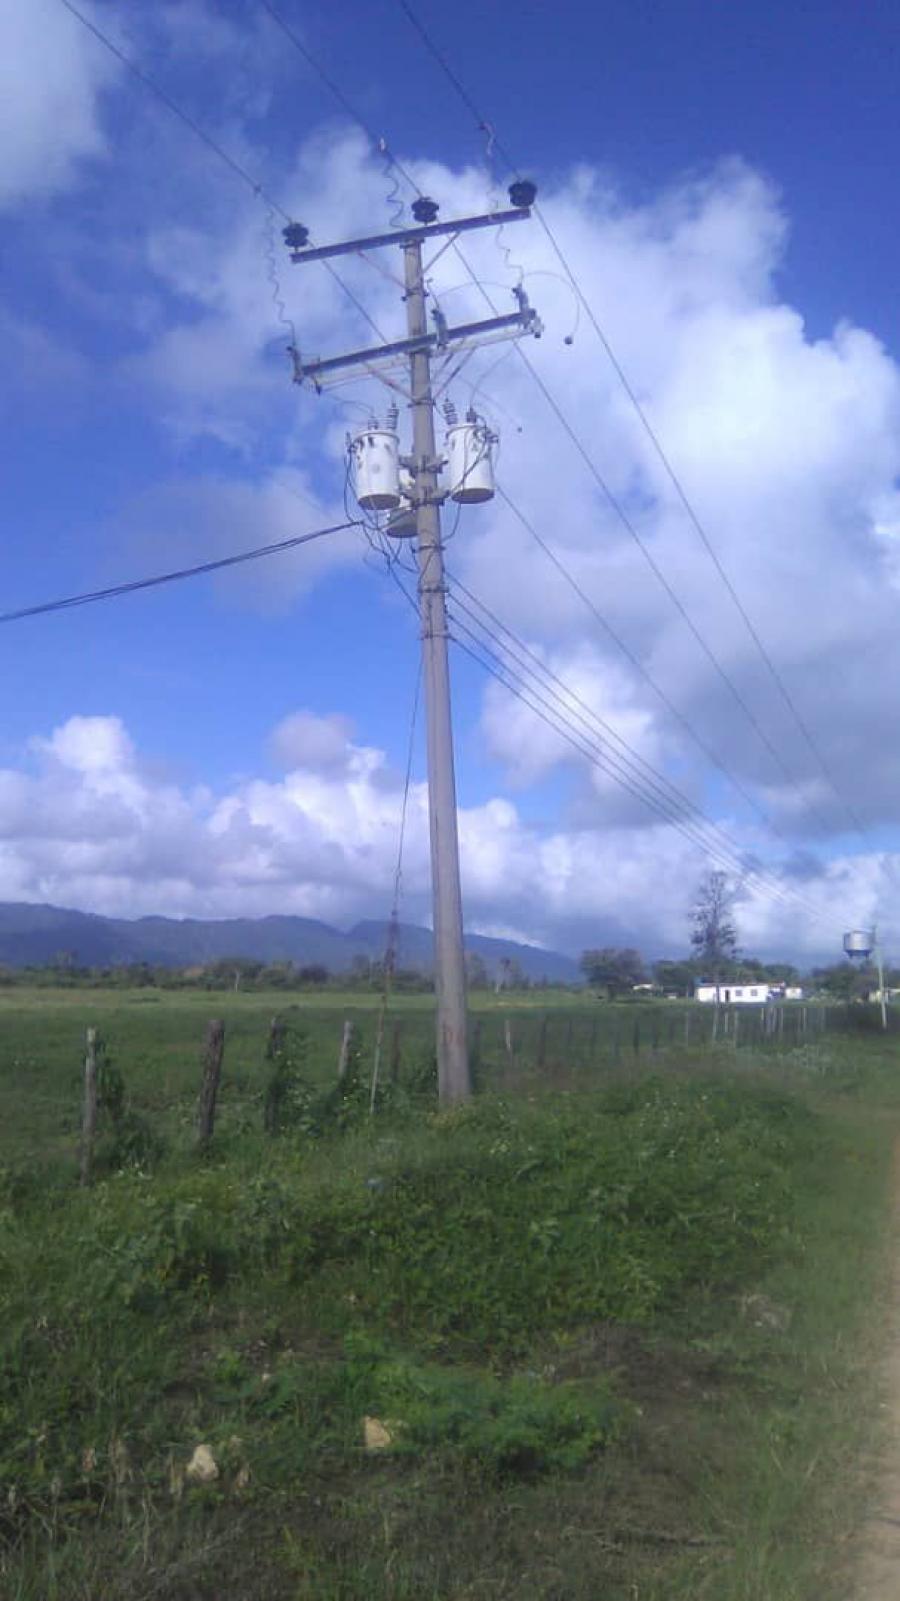 Foto Terreno en Venta en Chichiriviche, Falc�n - U$D 28.000 - TEV132539 - BienesOnLine